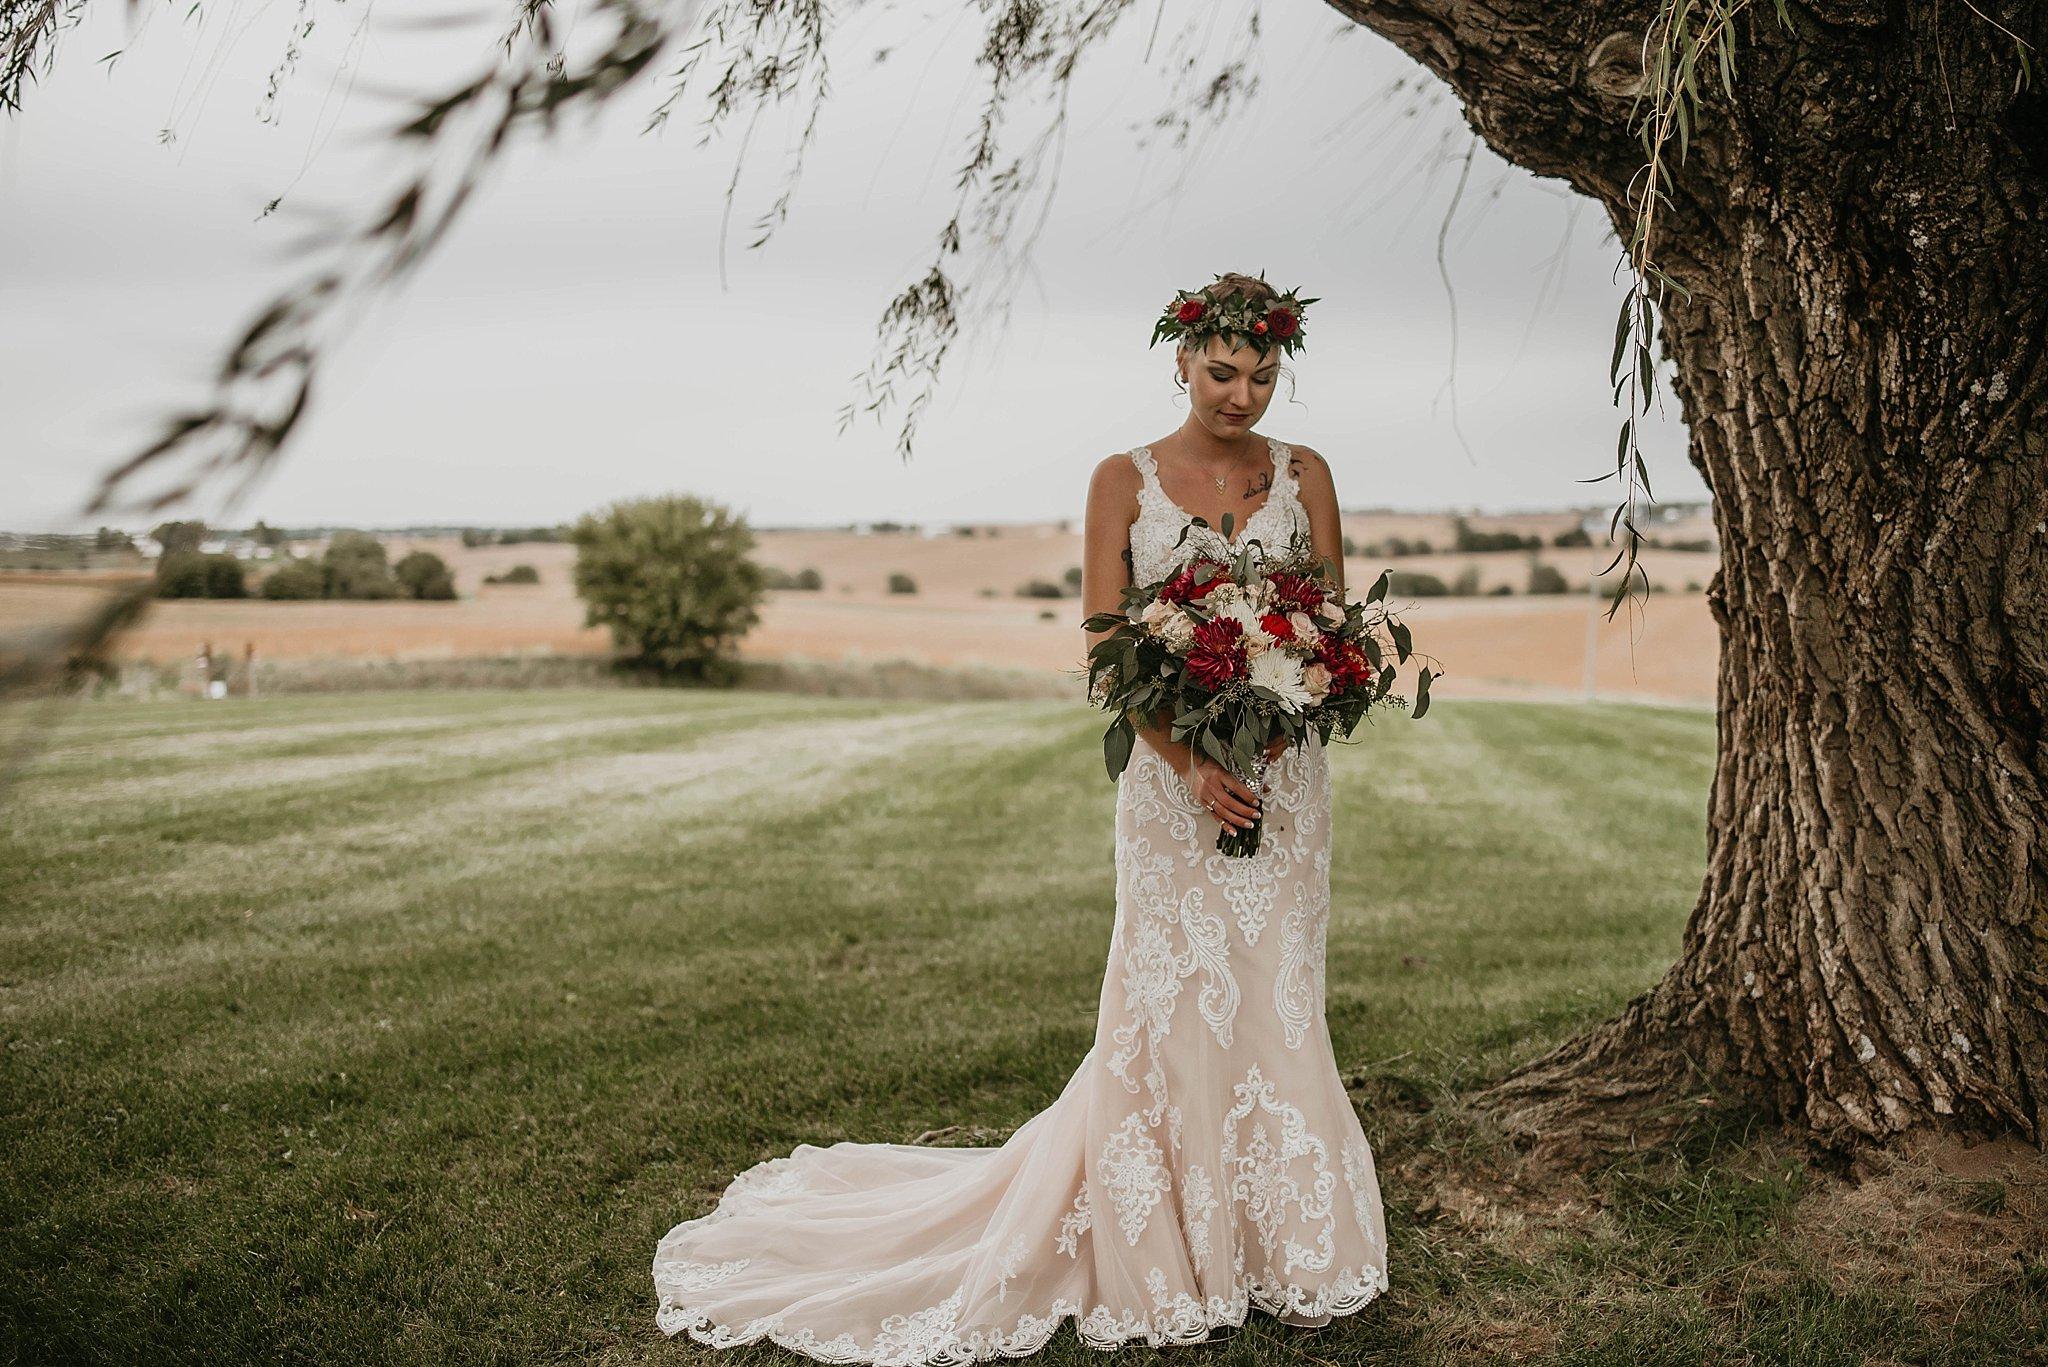 DesMoines-Iowa-Wedding-Photography-Destination-Photographer_0156.jpg